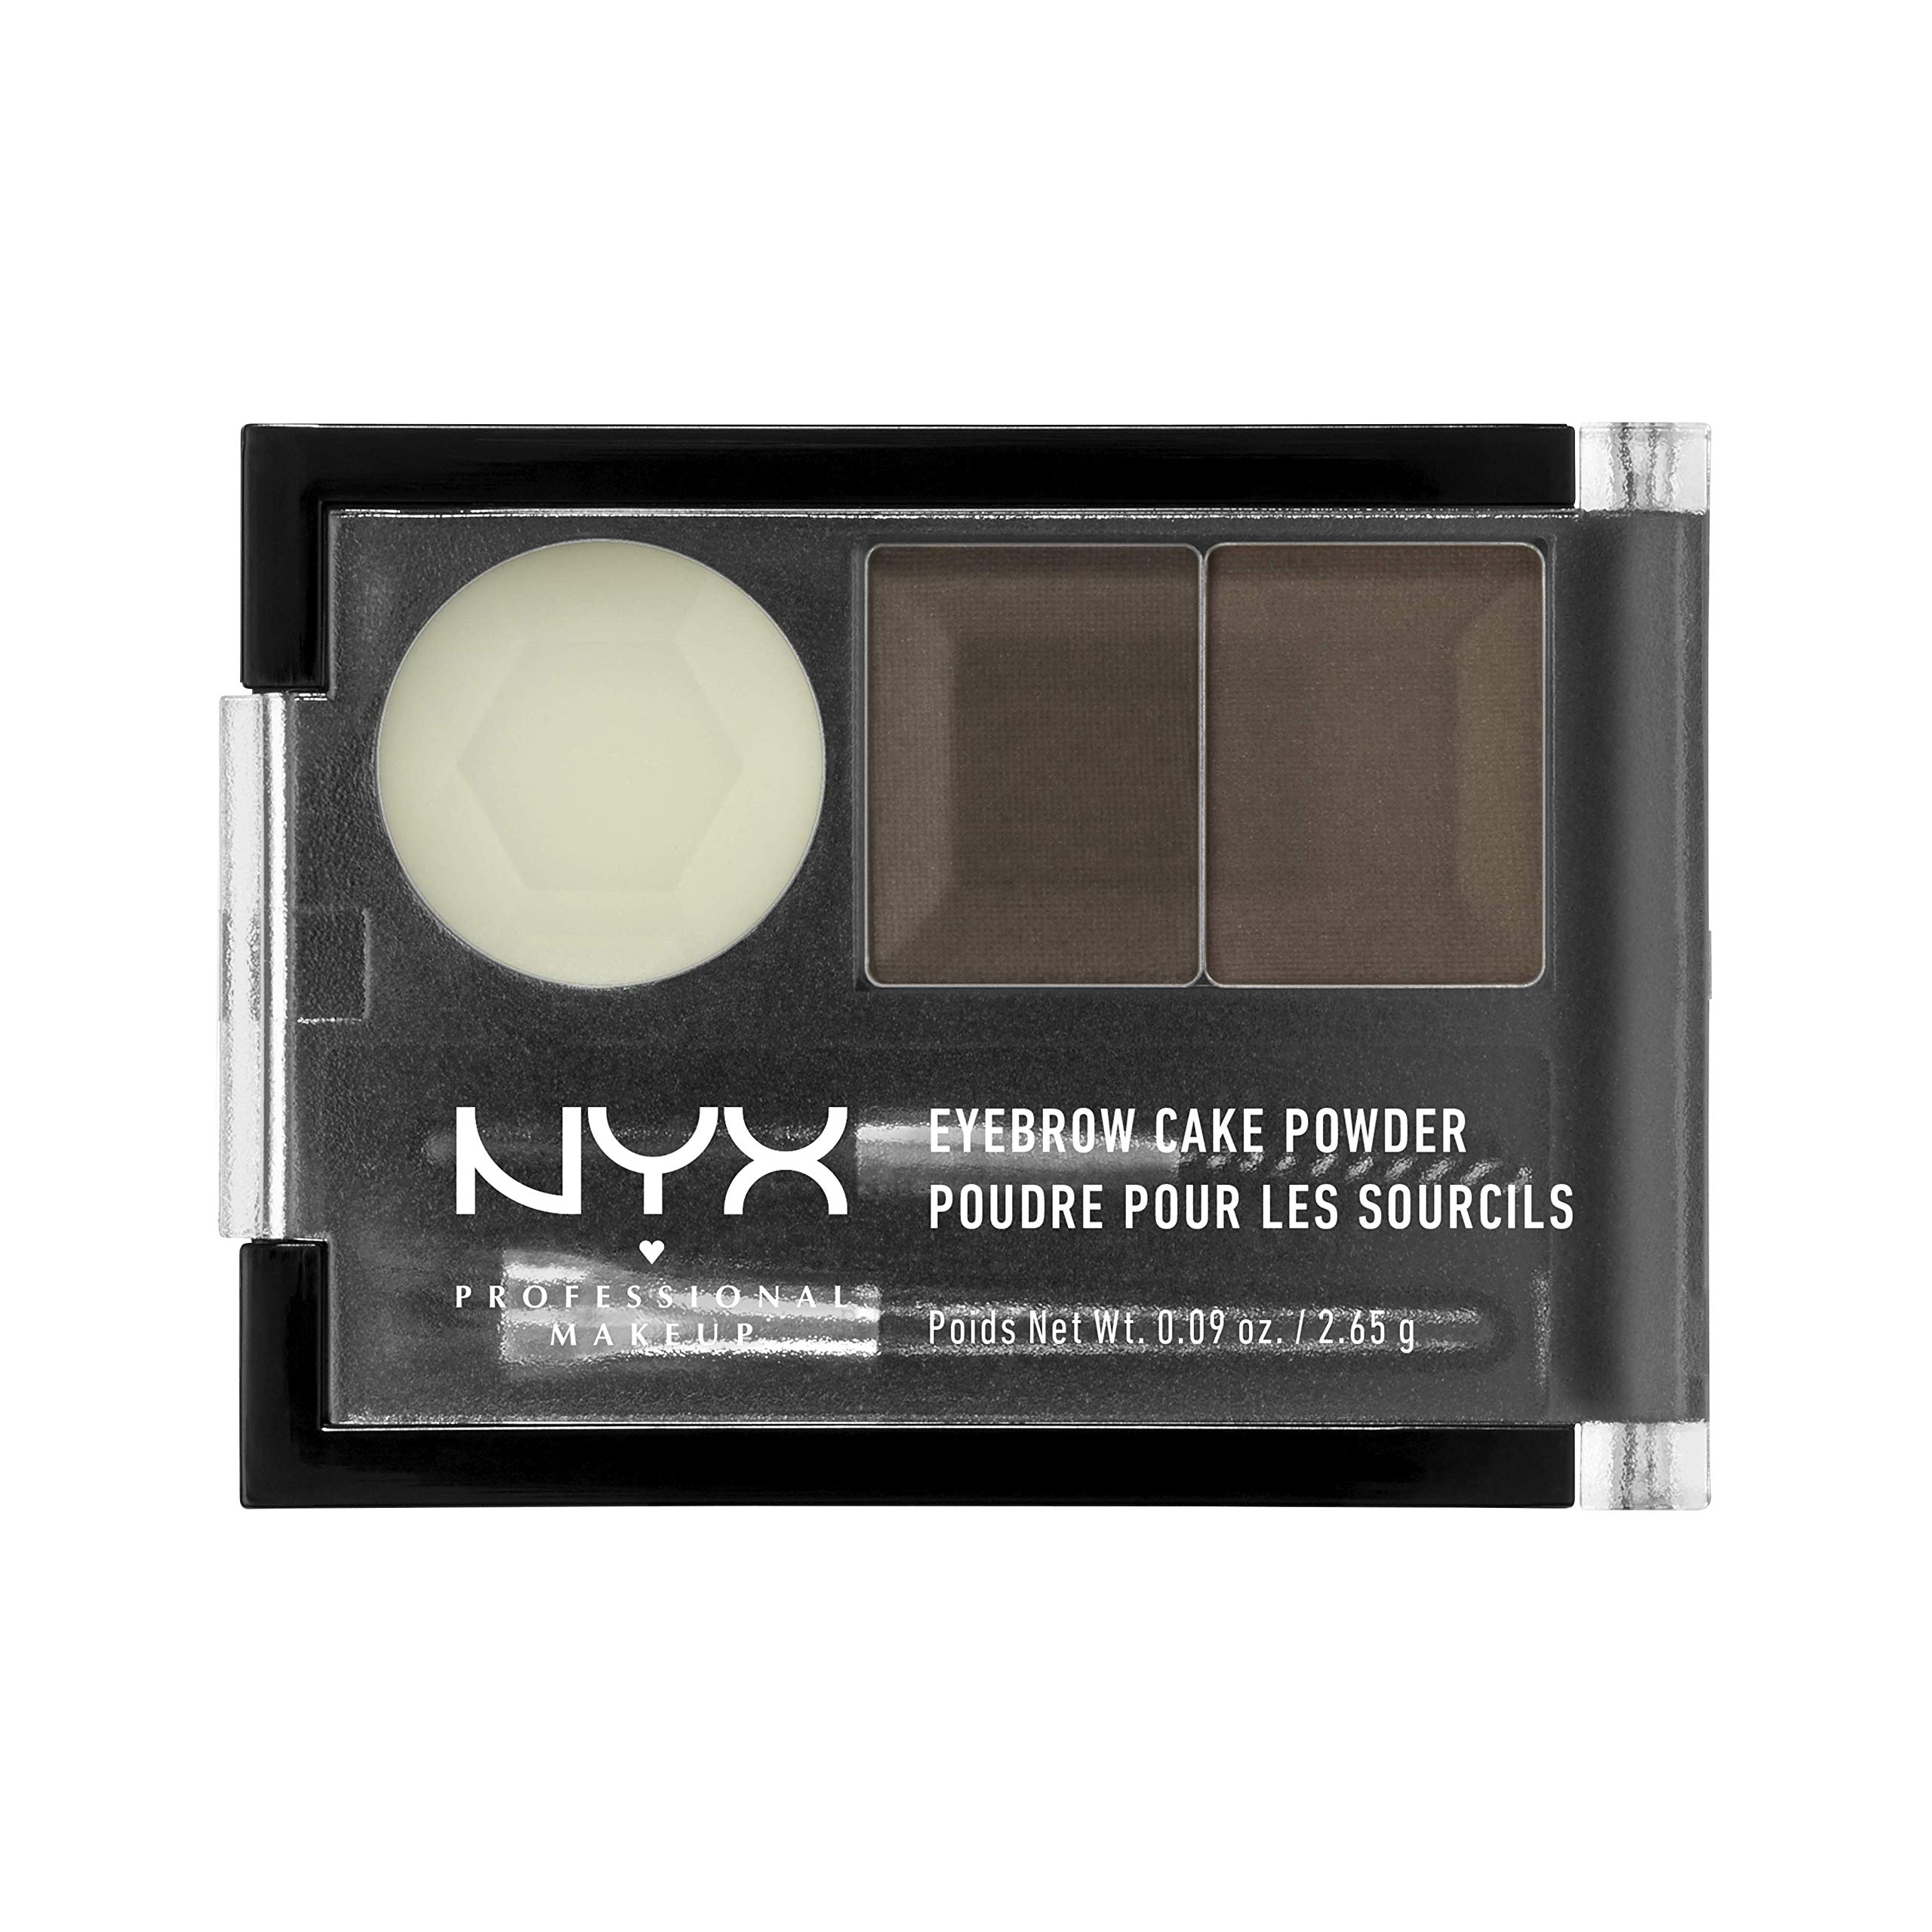 NYX PROFESSIONAL MAKEUP Eyebrow Cake Powder, Dark Brown/Brown